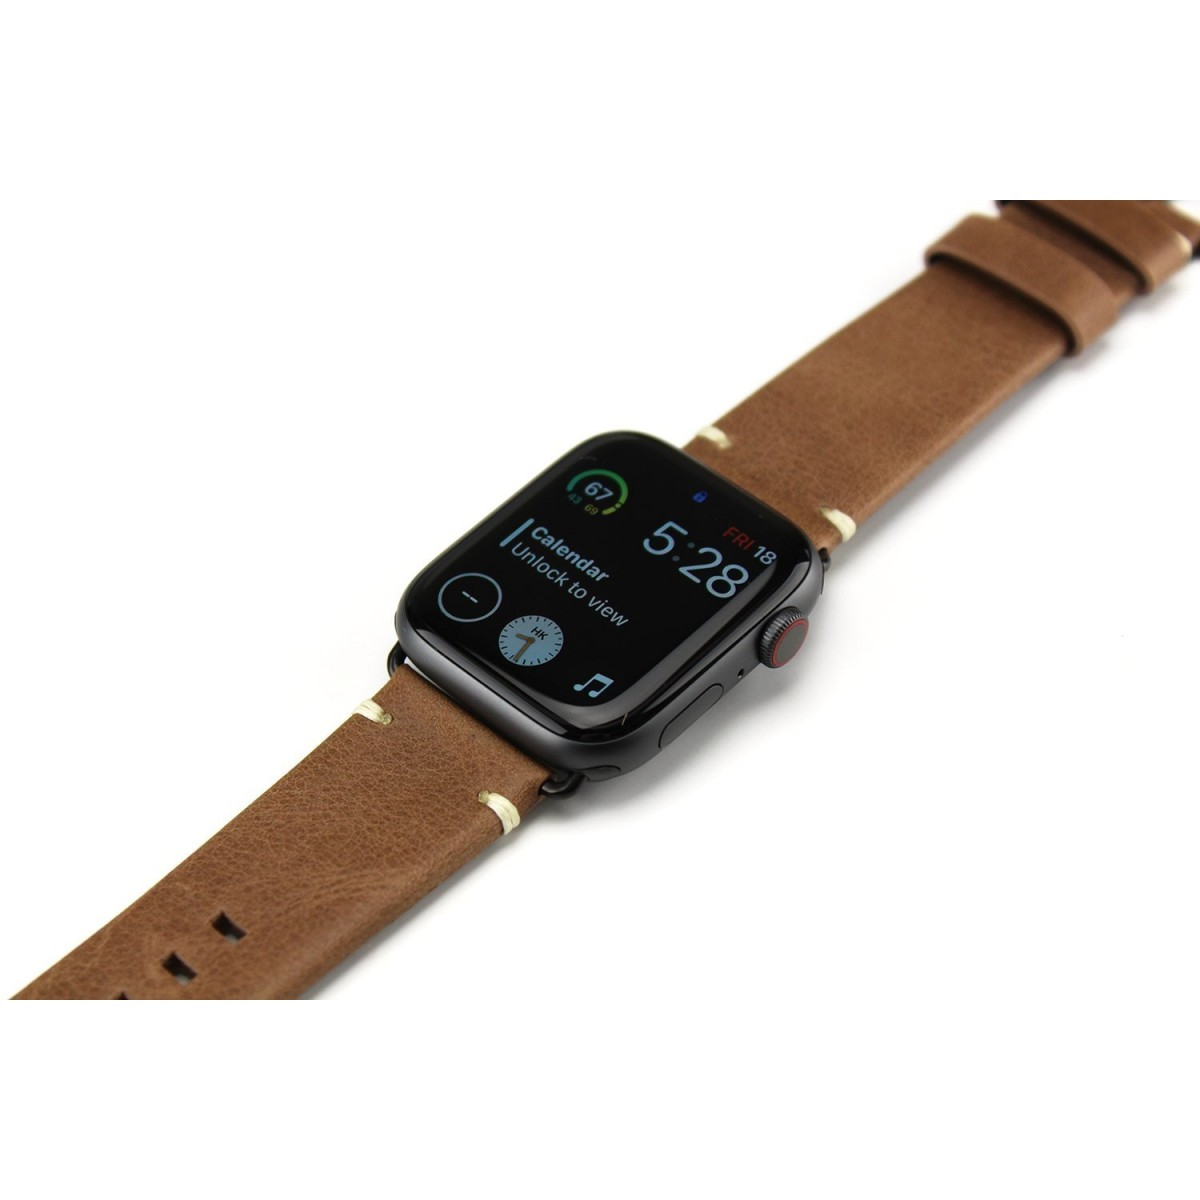 348be1464 Andar The Watch Band - Mukama